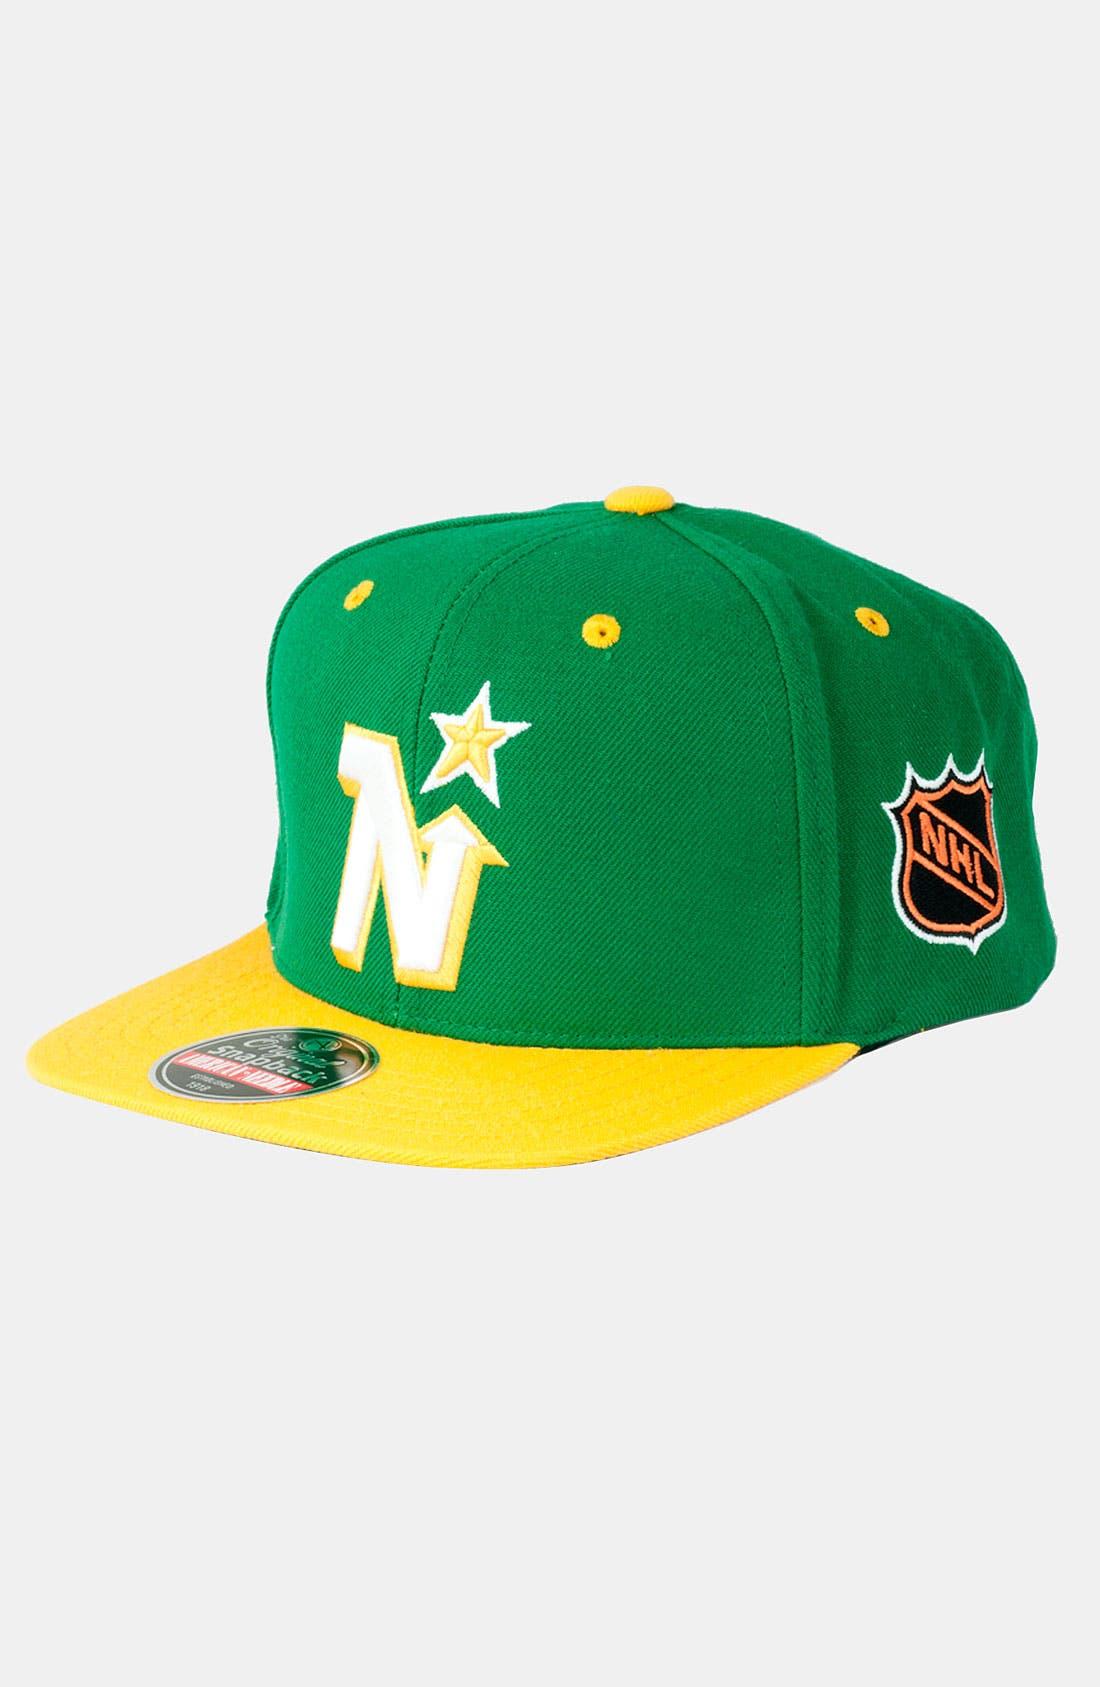 Main Image - American Needle 'North Stars - Blockhead' Snapback Baseball Cap